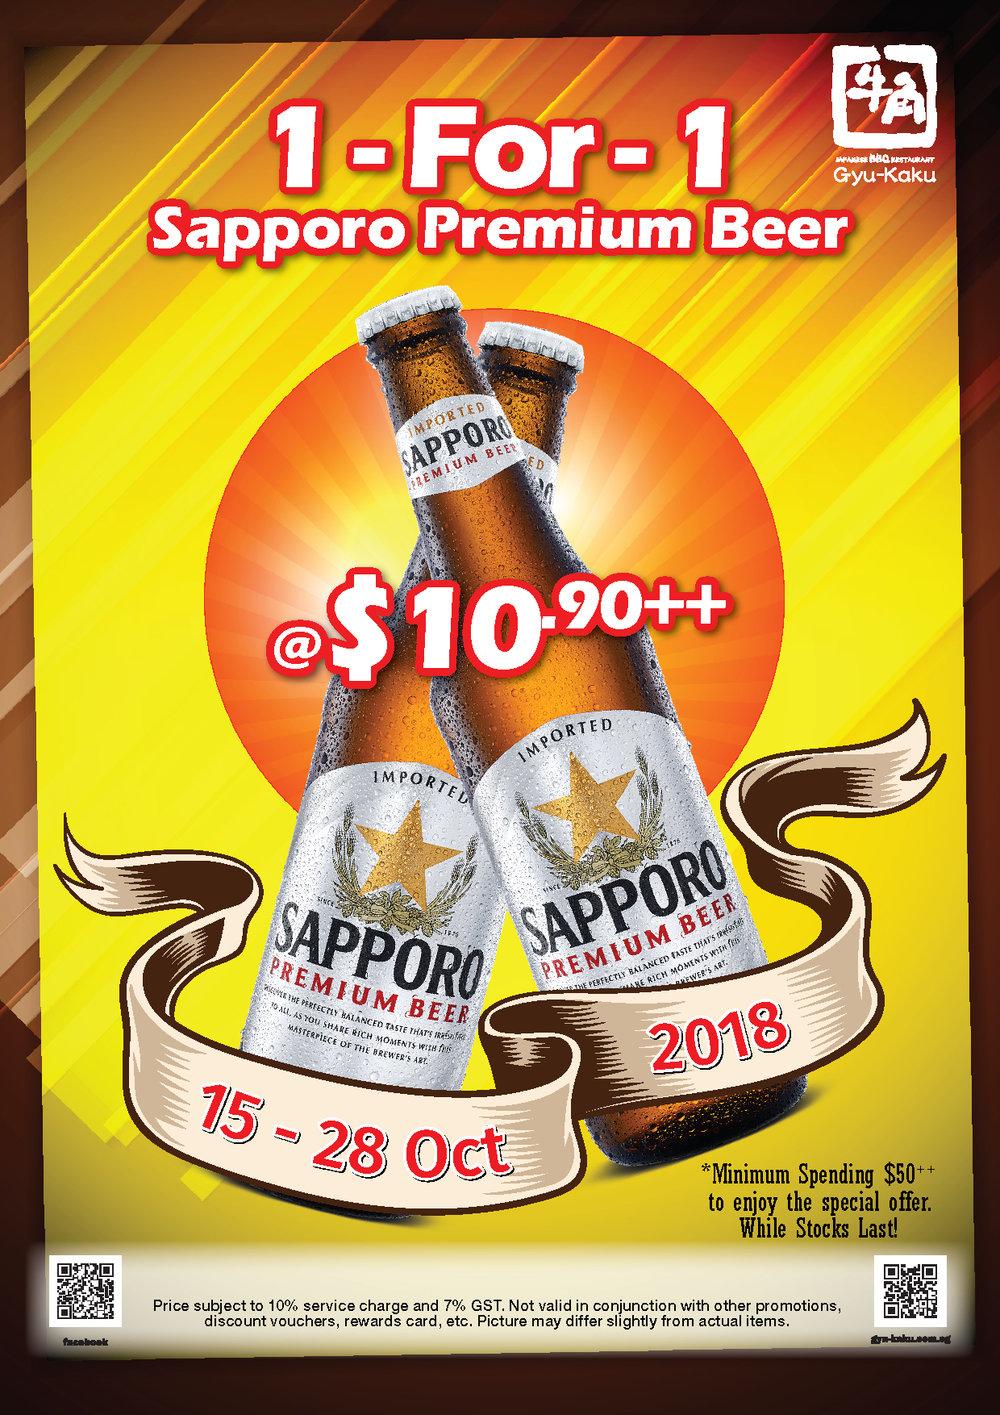 Promo_Sapporo_1for1-01.jpg